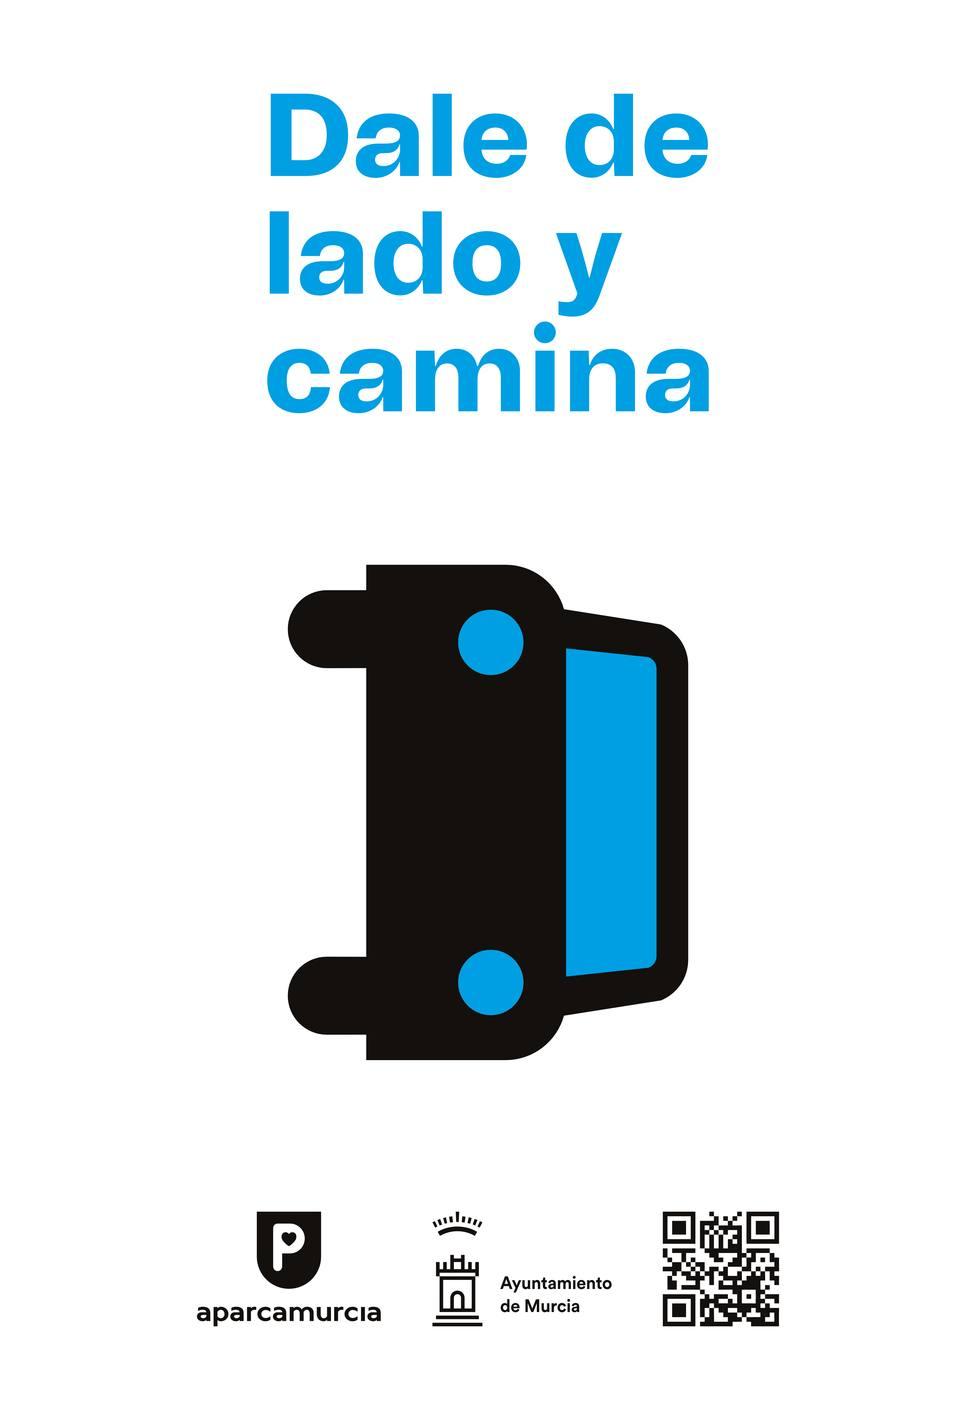 ctv-6ia-campaa-aparcamurcia-2021-02